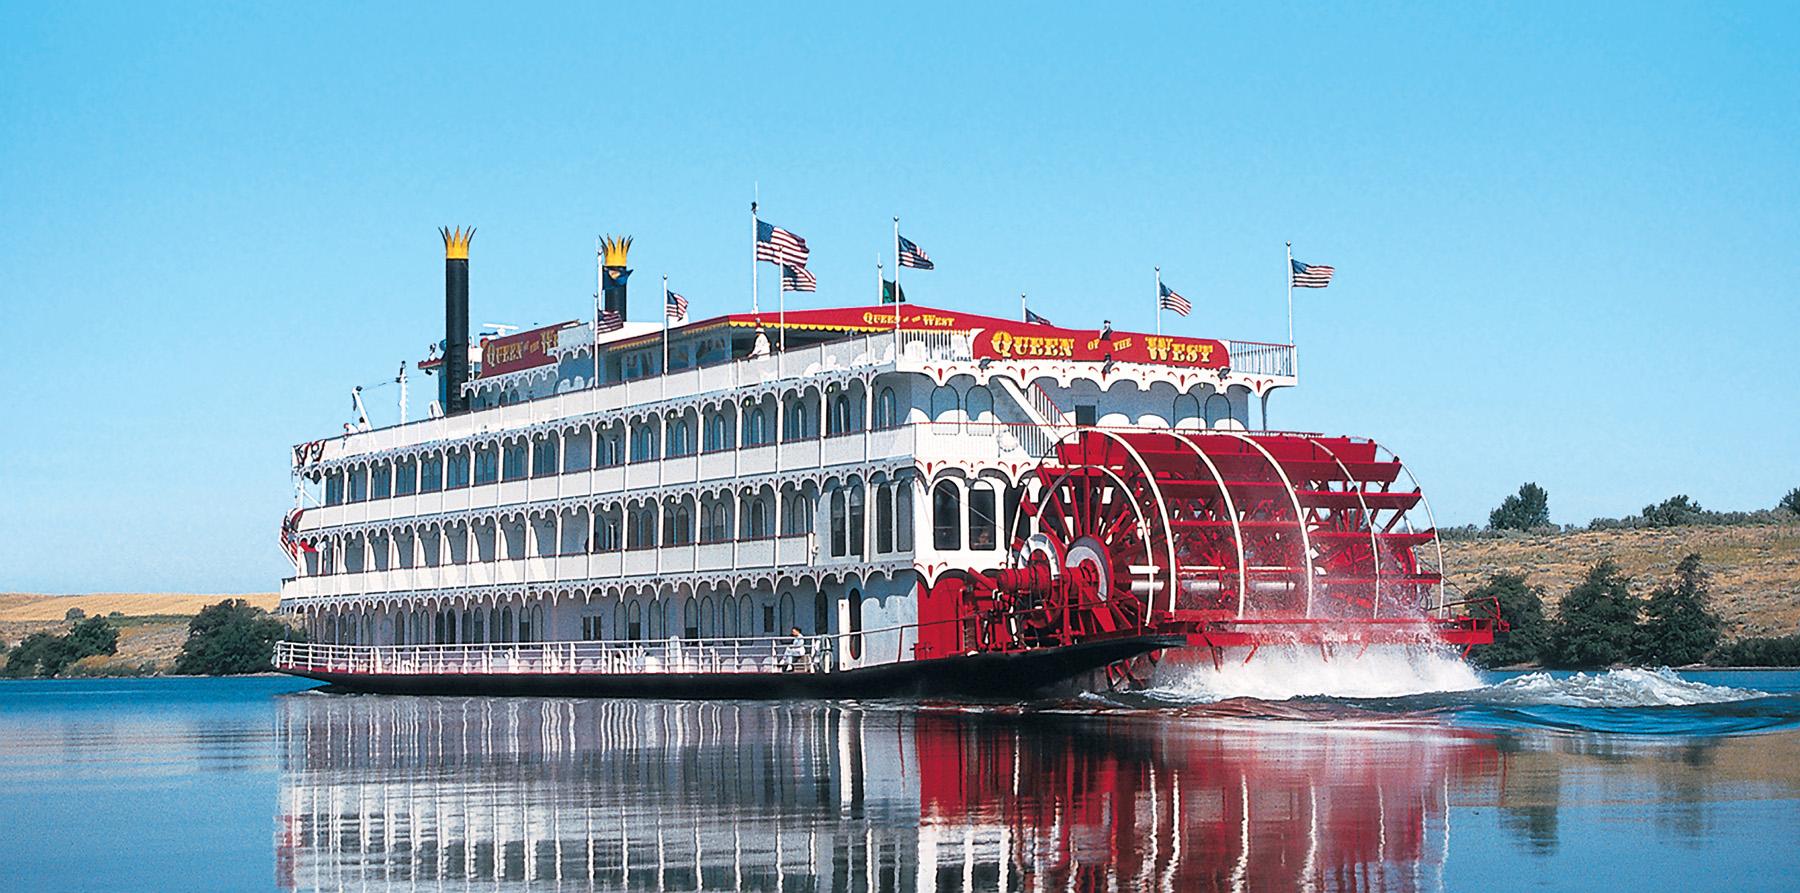 Casino Cruise Launches New Site Design